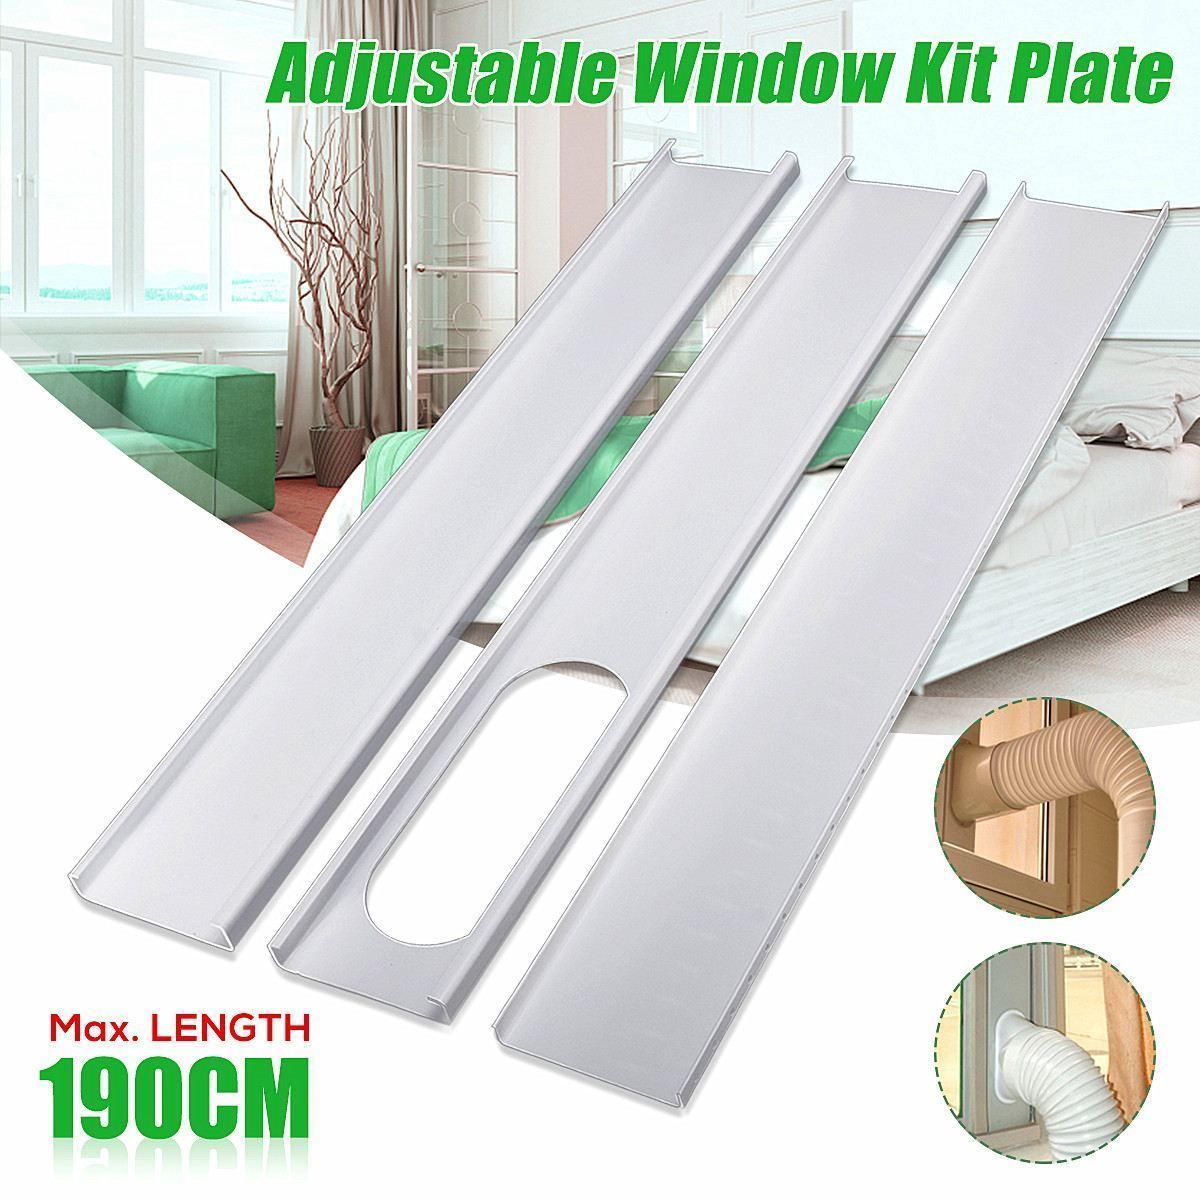 3pcs Adjustable 190cm Air Conditioner Window Slide Pvc Plate Exhaust Hose Tube Portable Air Conditioner Window Window Air Conditioner Portable Air Conditioner